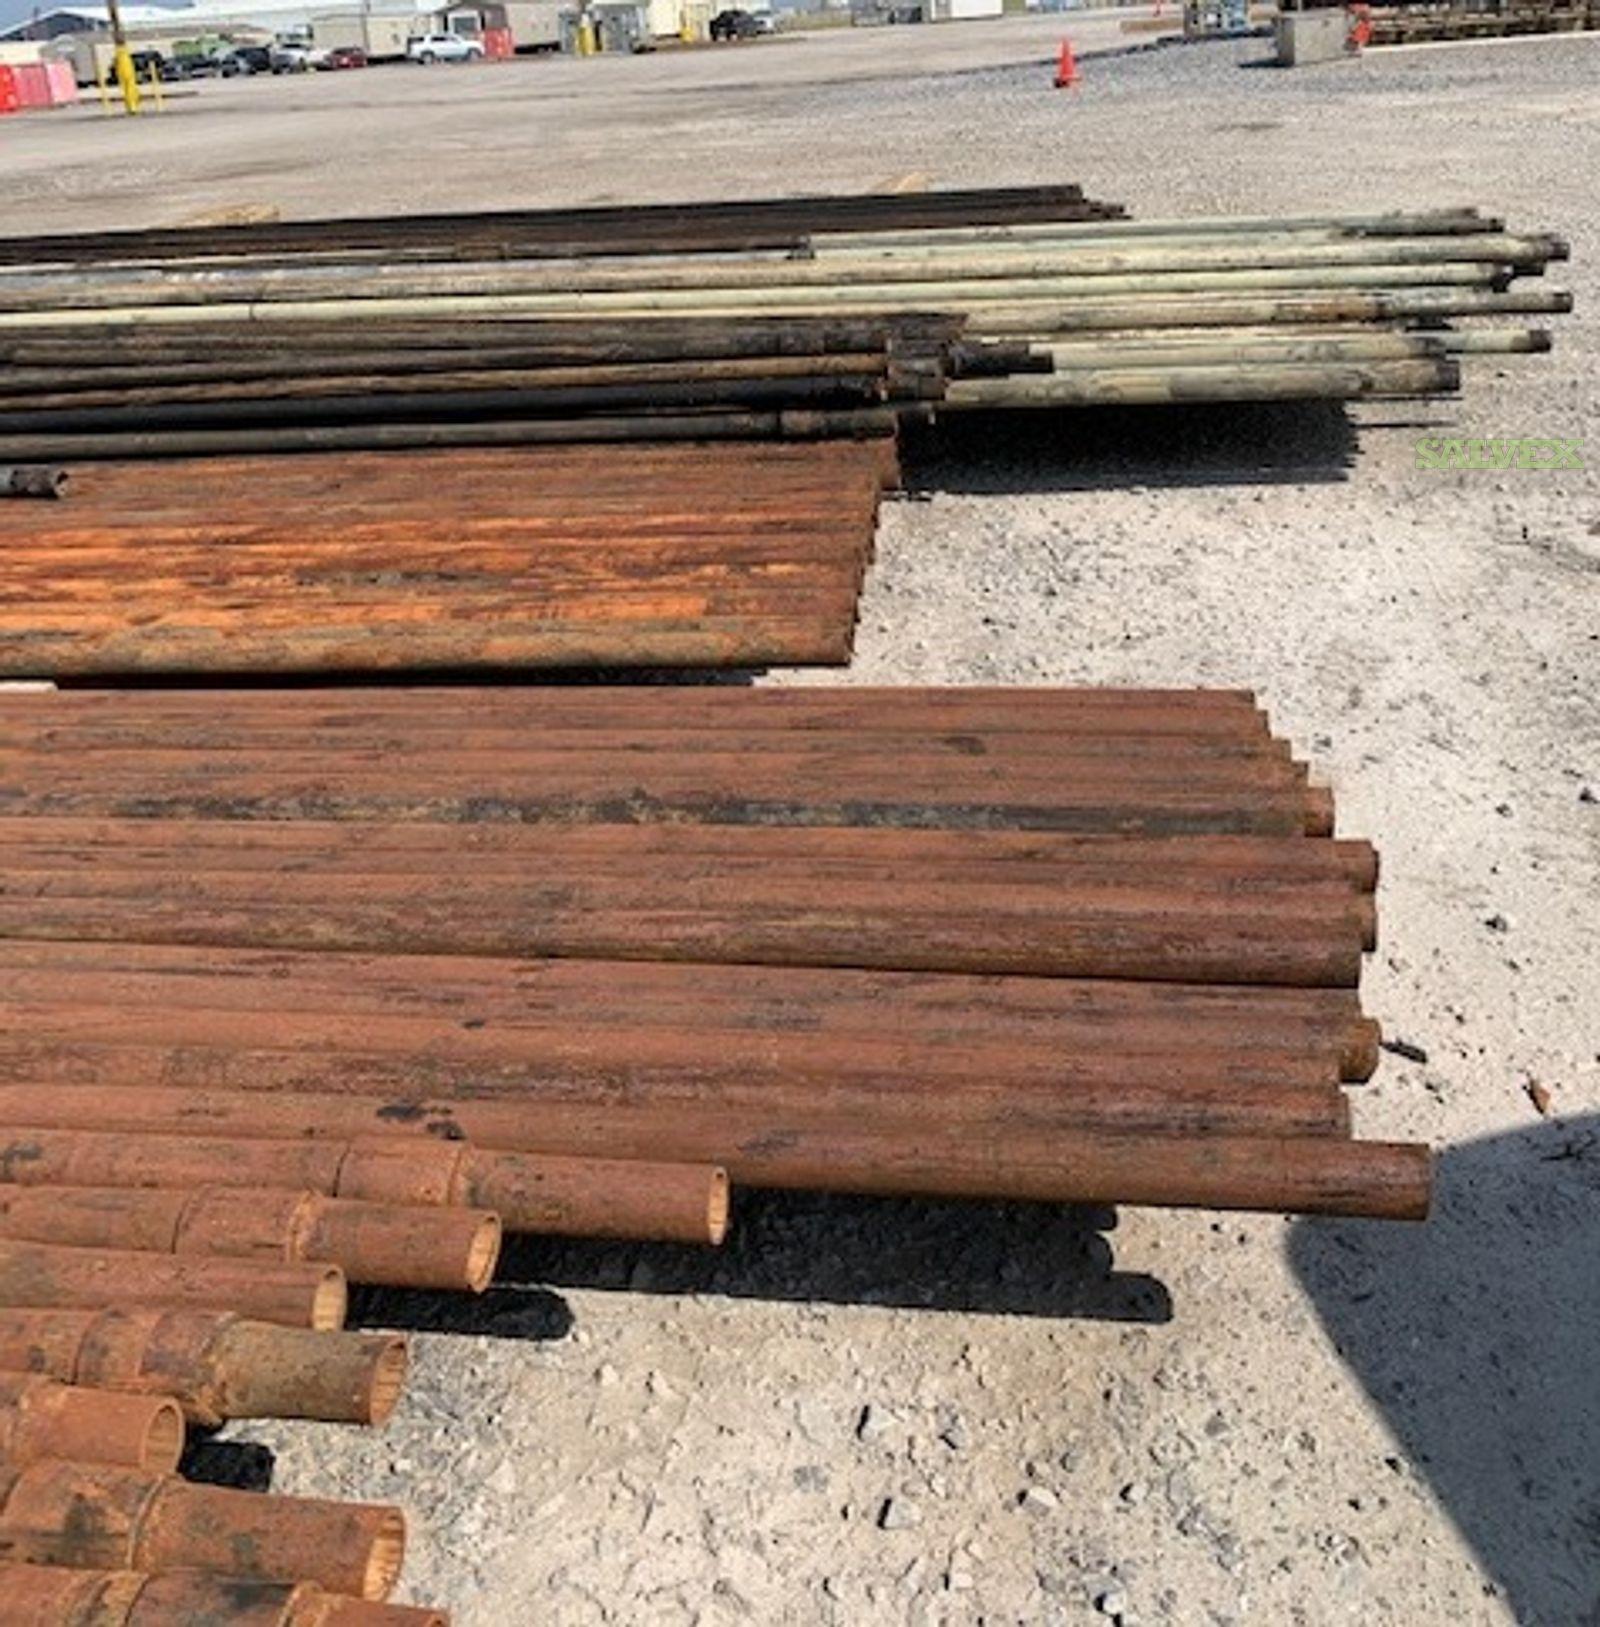 2 7/8 - 3 1/2 N-80 EUE 8R Structural Tubing (15,424 Feet / 53 Metric Tons)